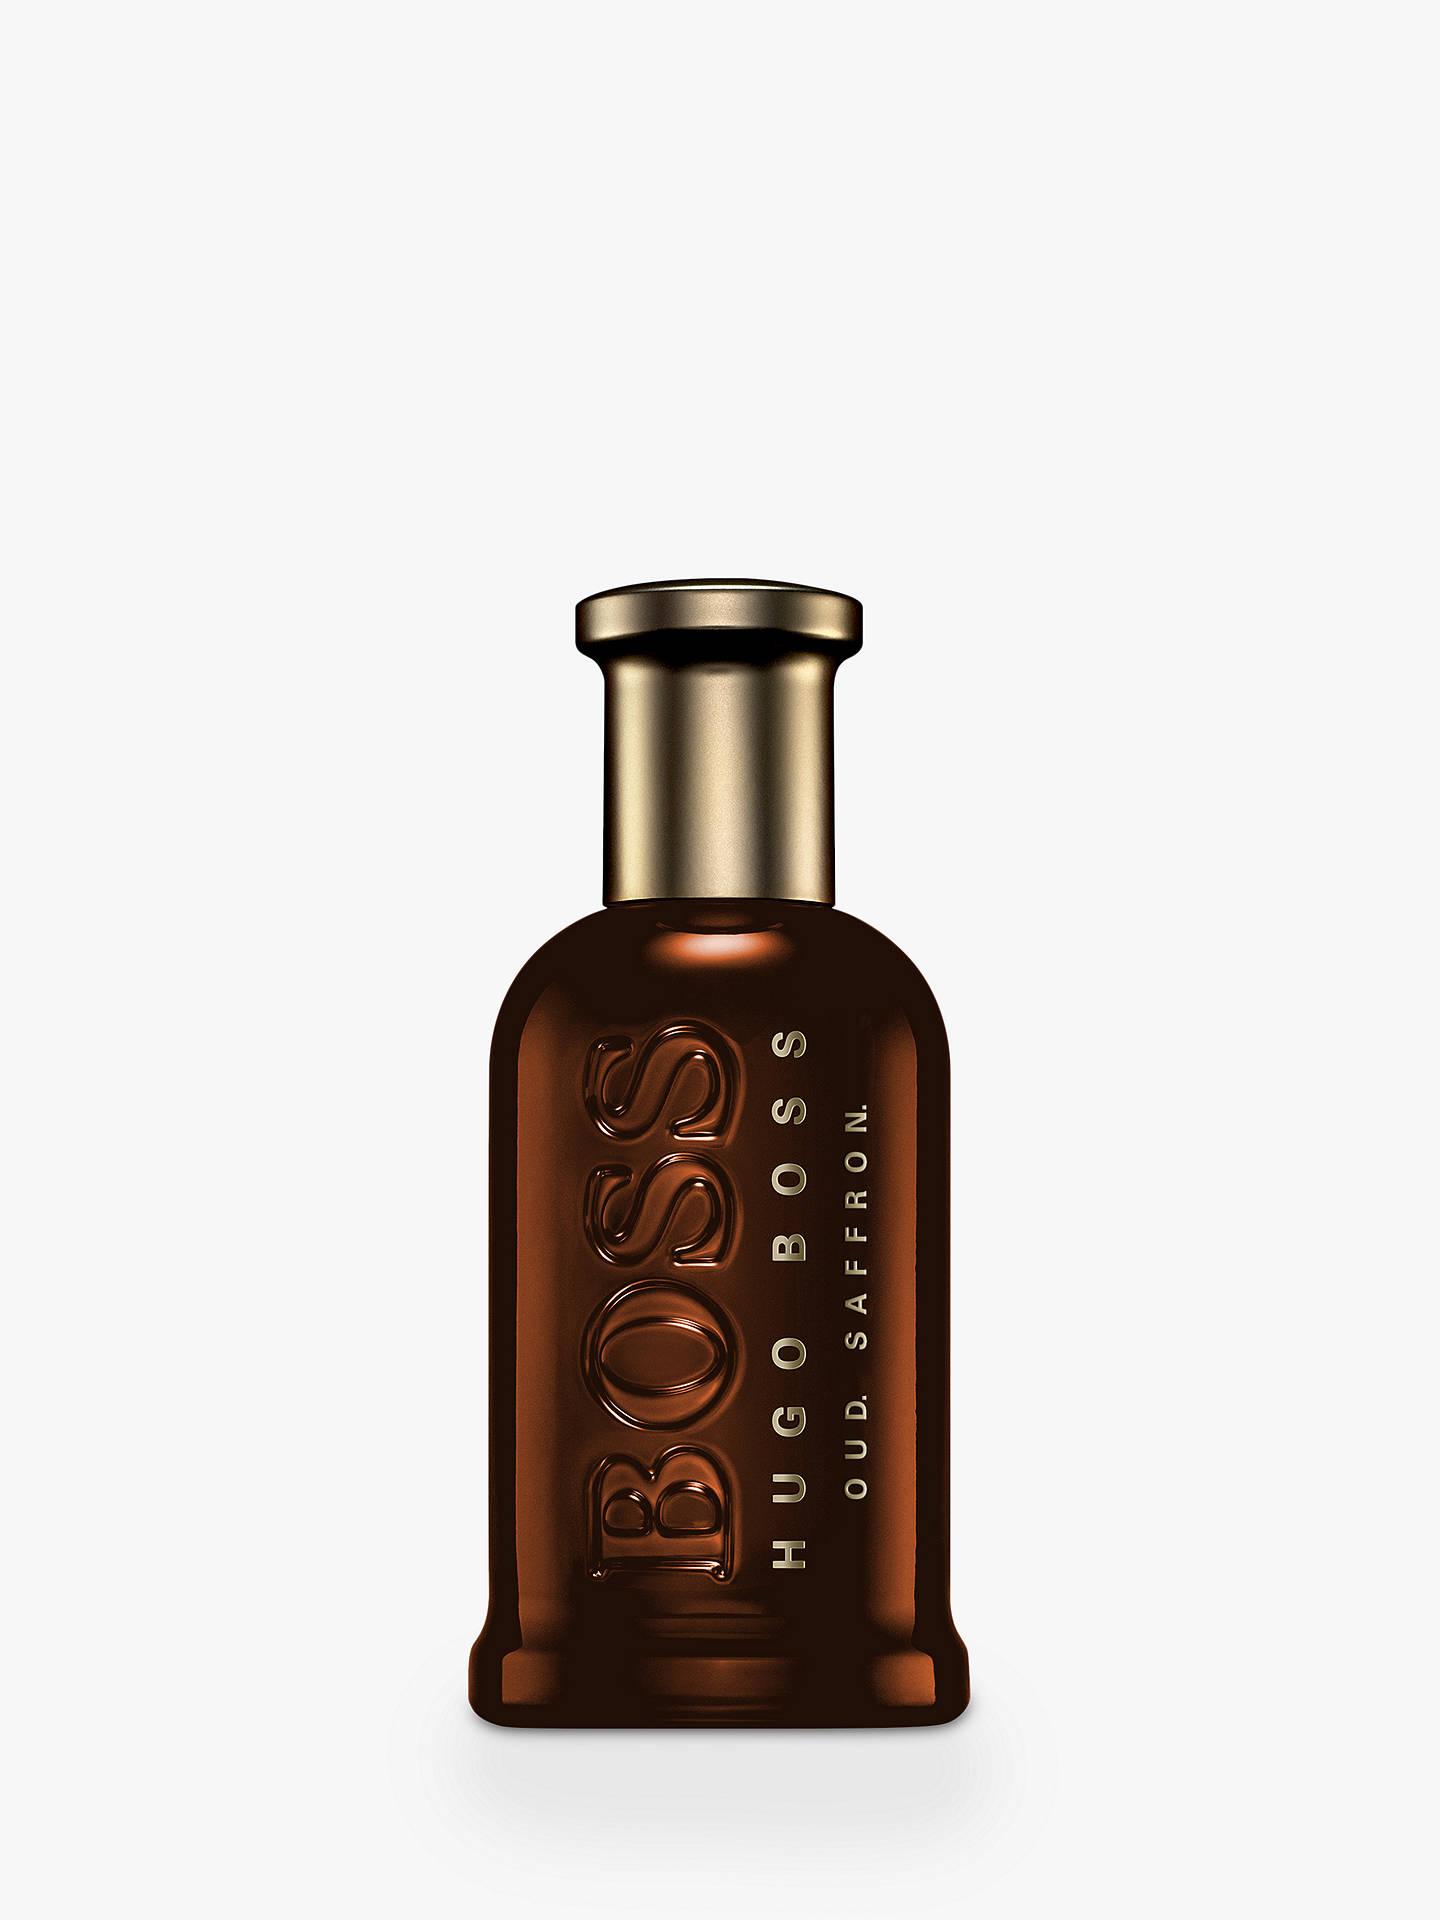 Hugo Boss Boss Oud Saffron Eau De Parfum Limited Edition 100ml At